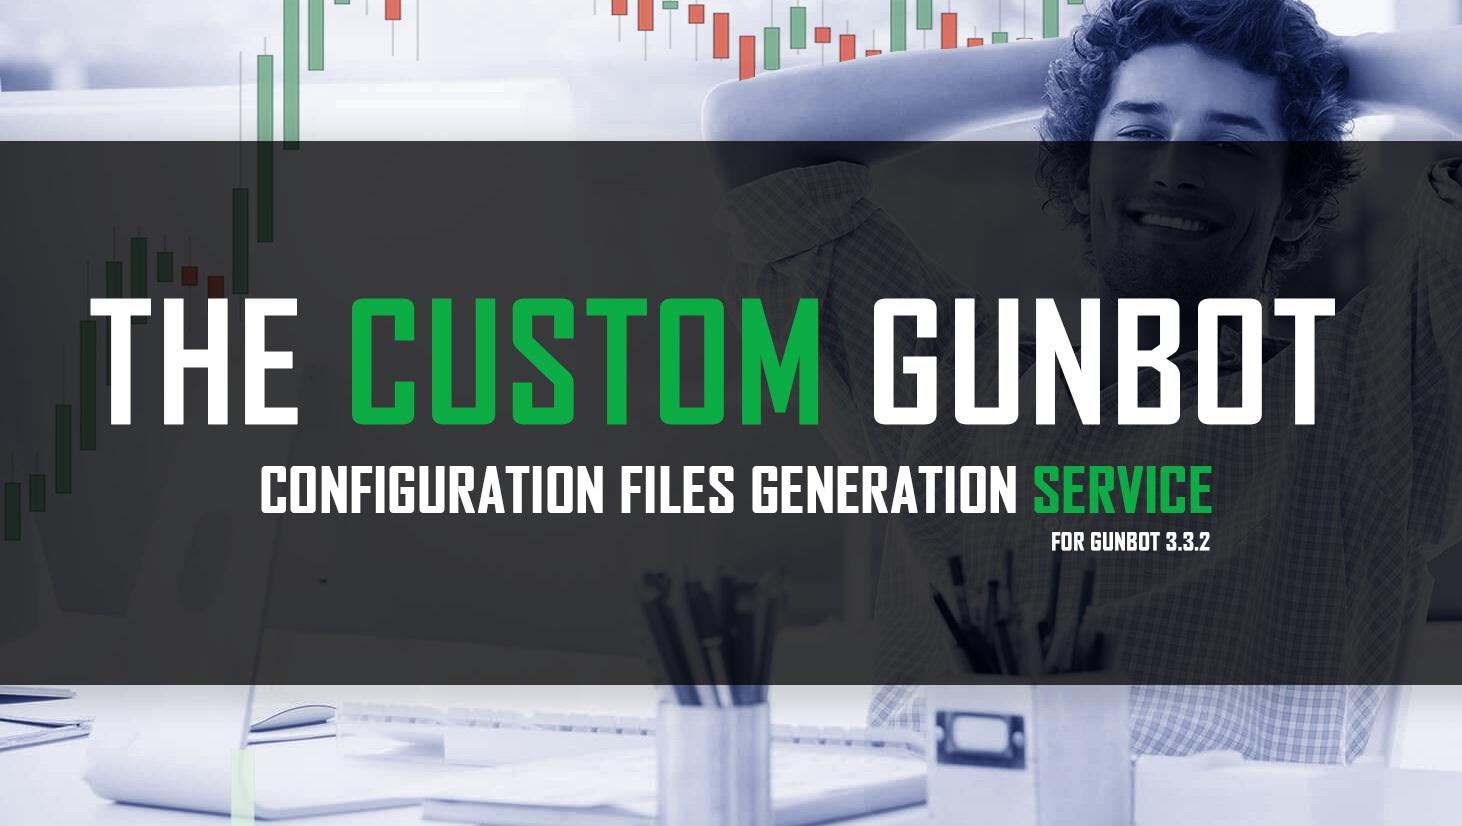 custom-gunbot-configuration-files-service